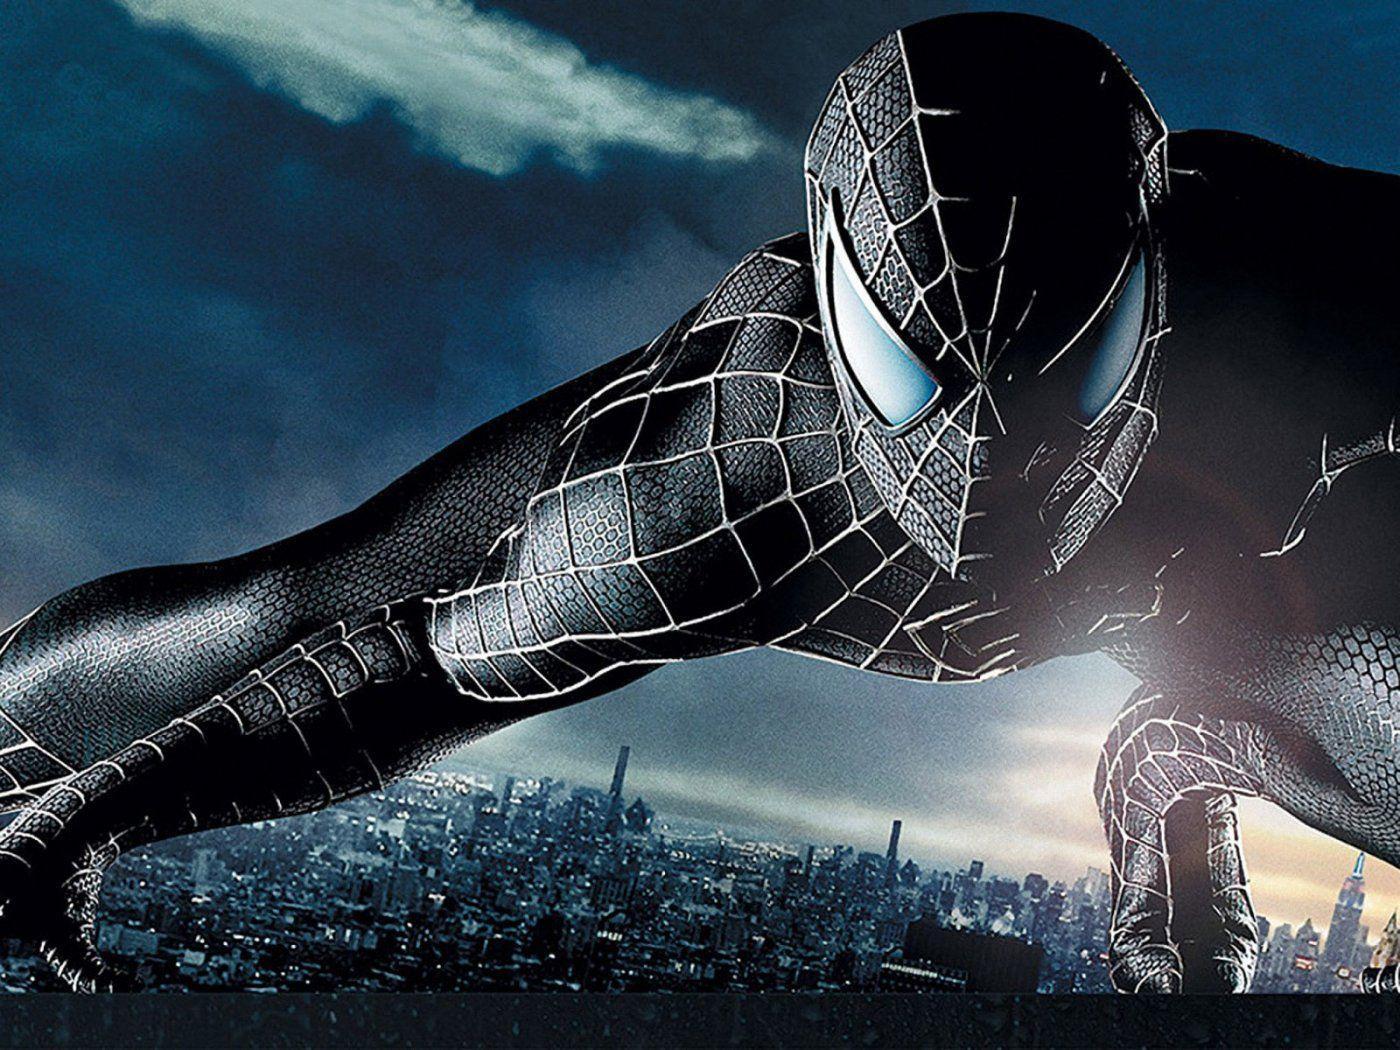 Spiderman 3 Black Suit Wallpapers Wallpaper Cave